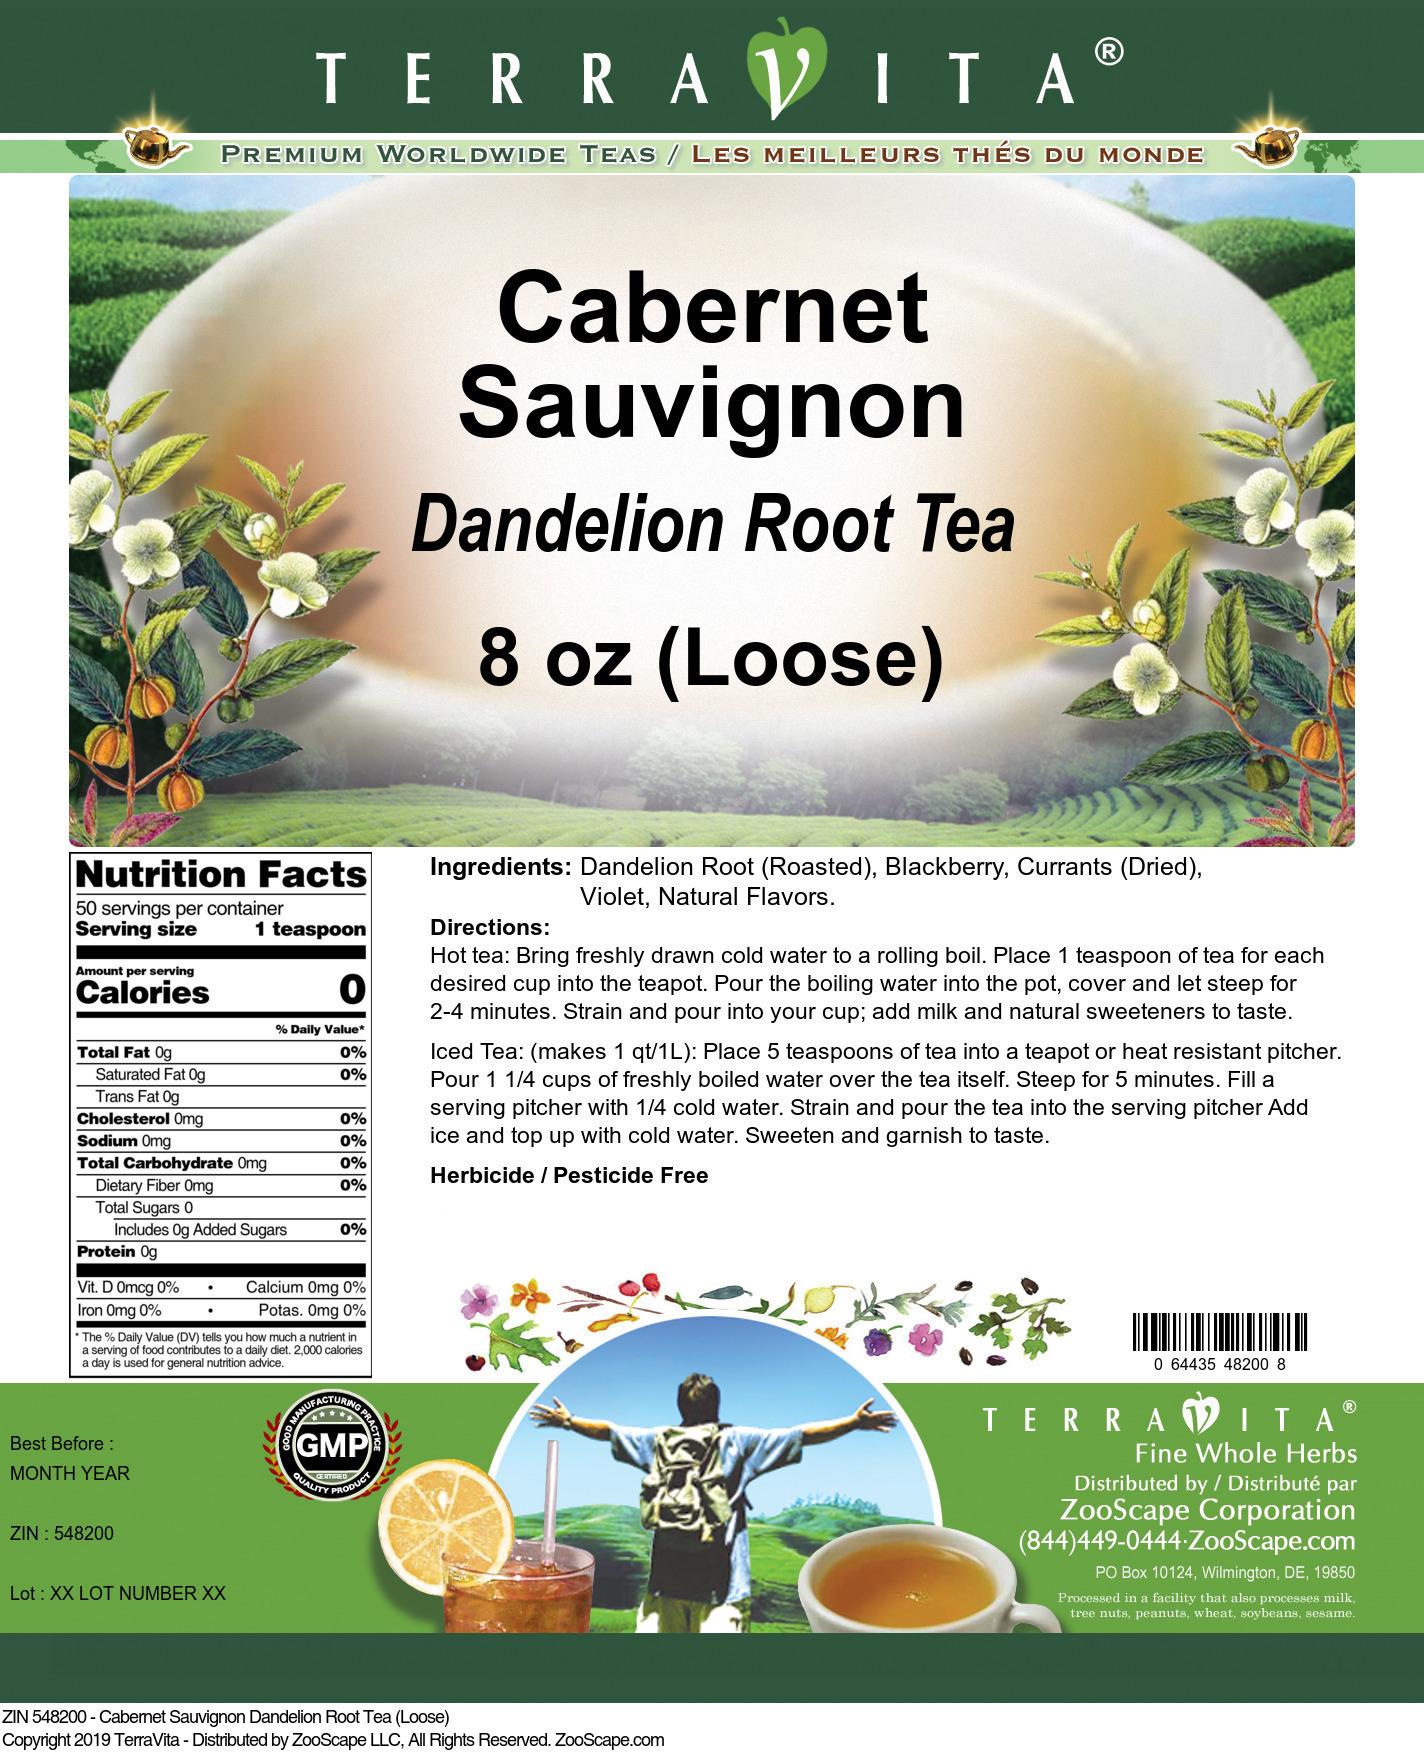 Cabernet Sauvignon Dandelion Root